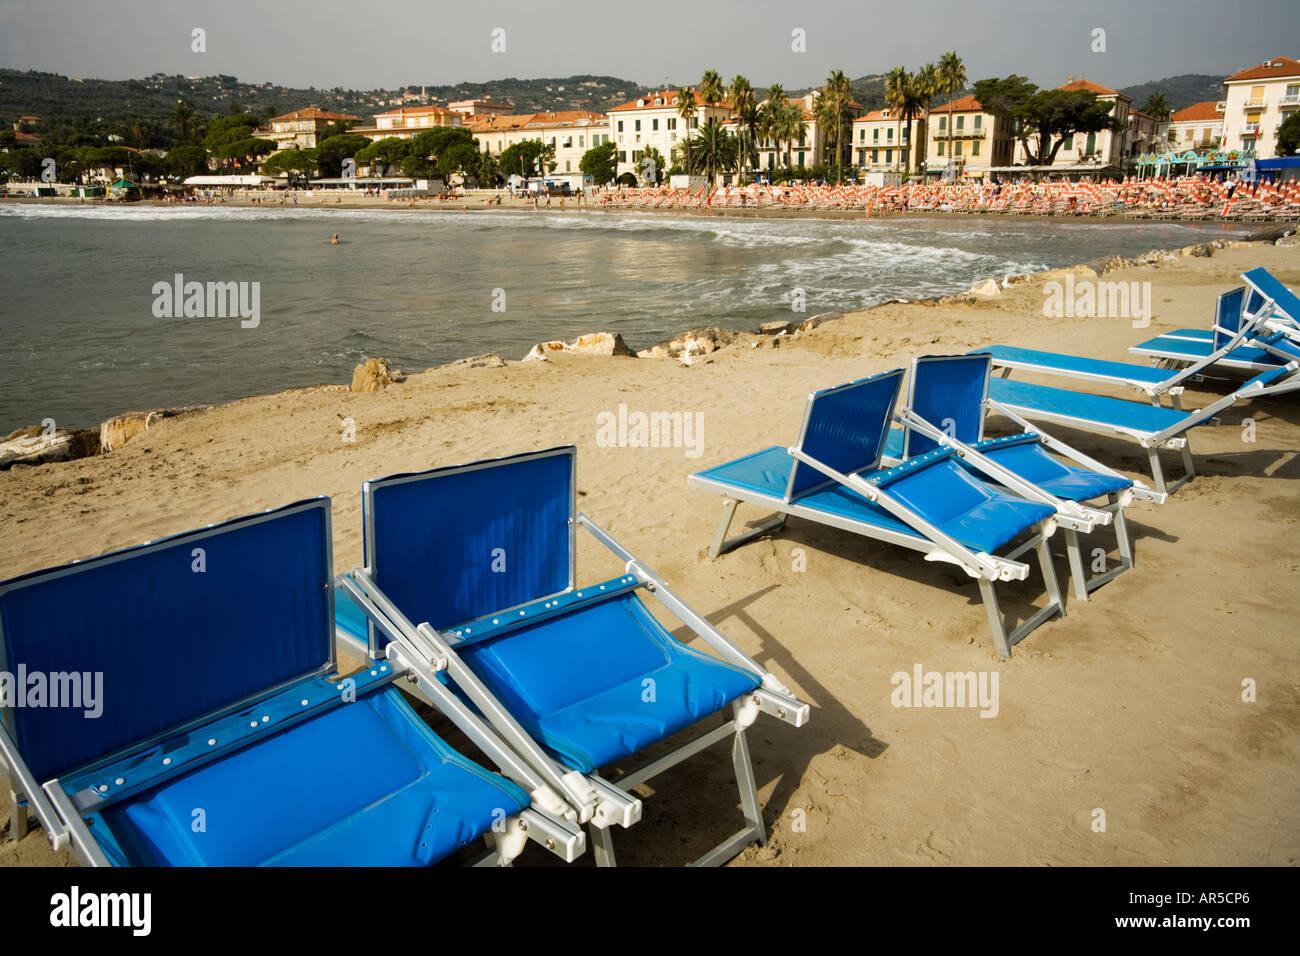 Spiaggia vuota vasca da bagno diano marina liguria italia foto